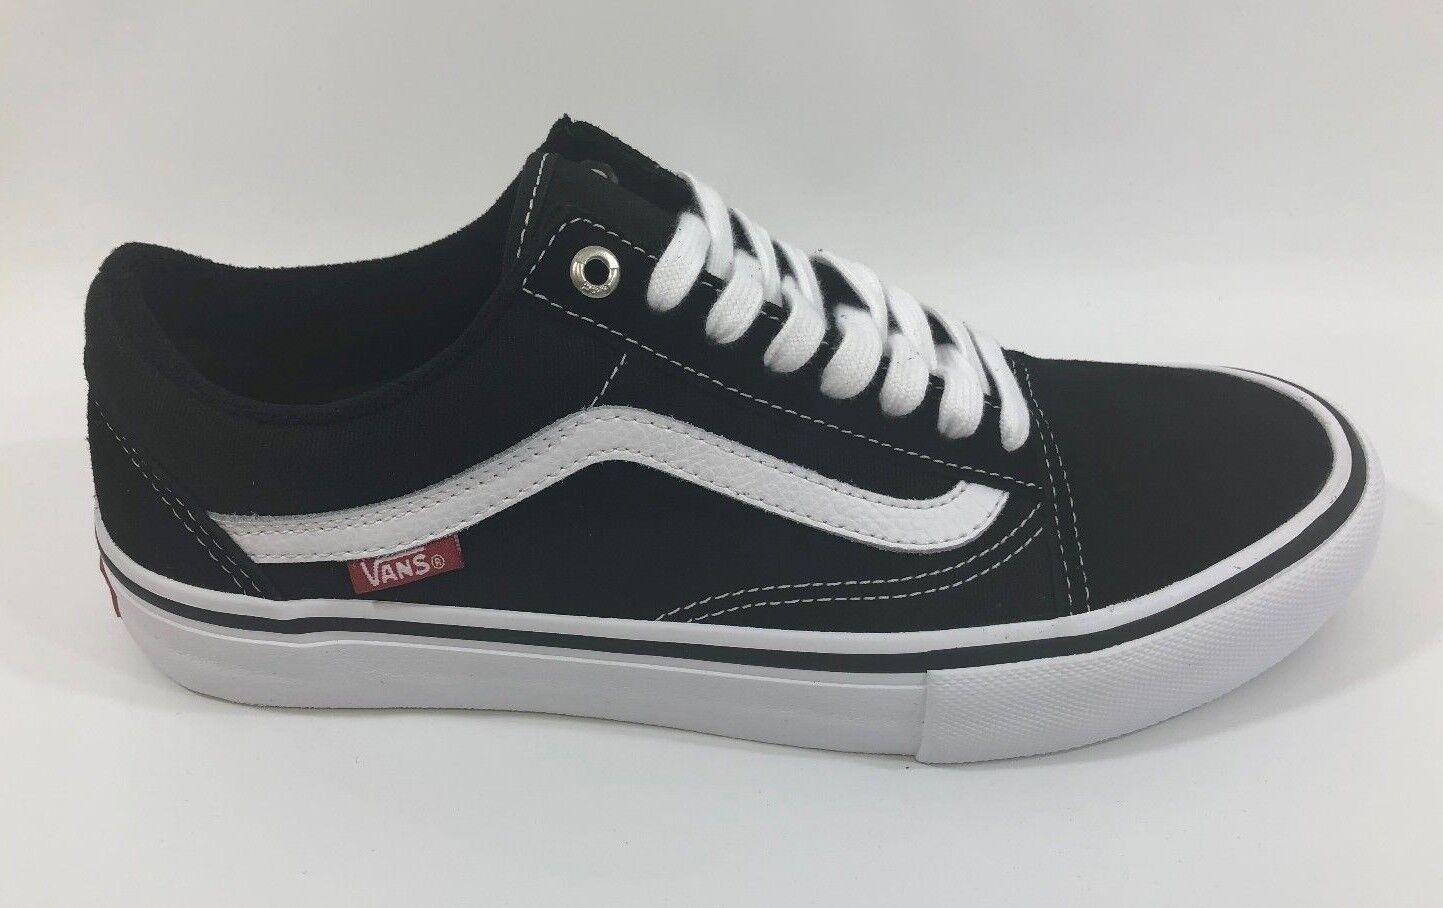 Vans Skate Old Skool Pro (Nero/White) Uomo Skate Vans Shoes fef80f